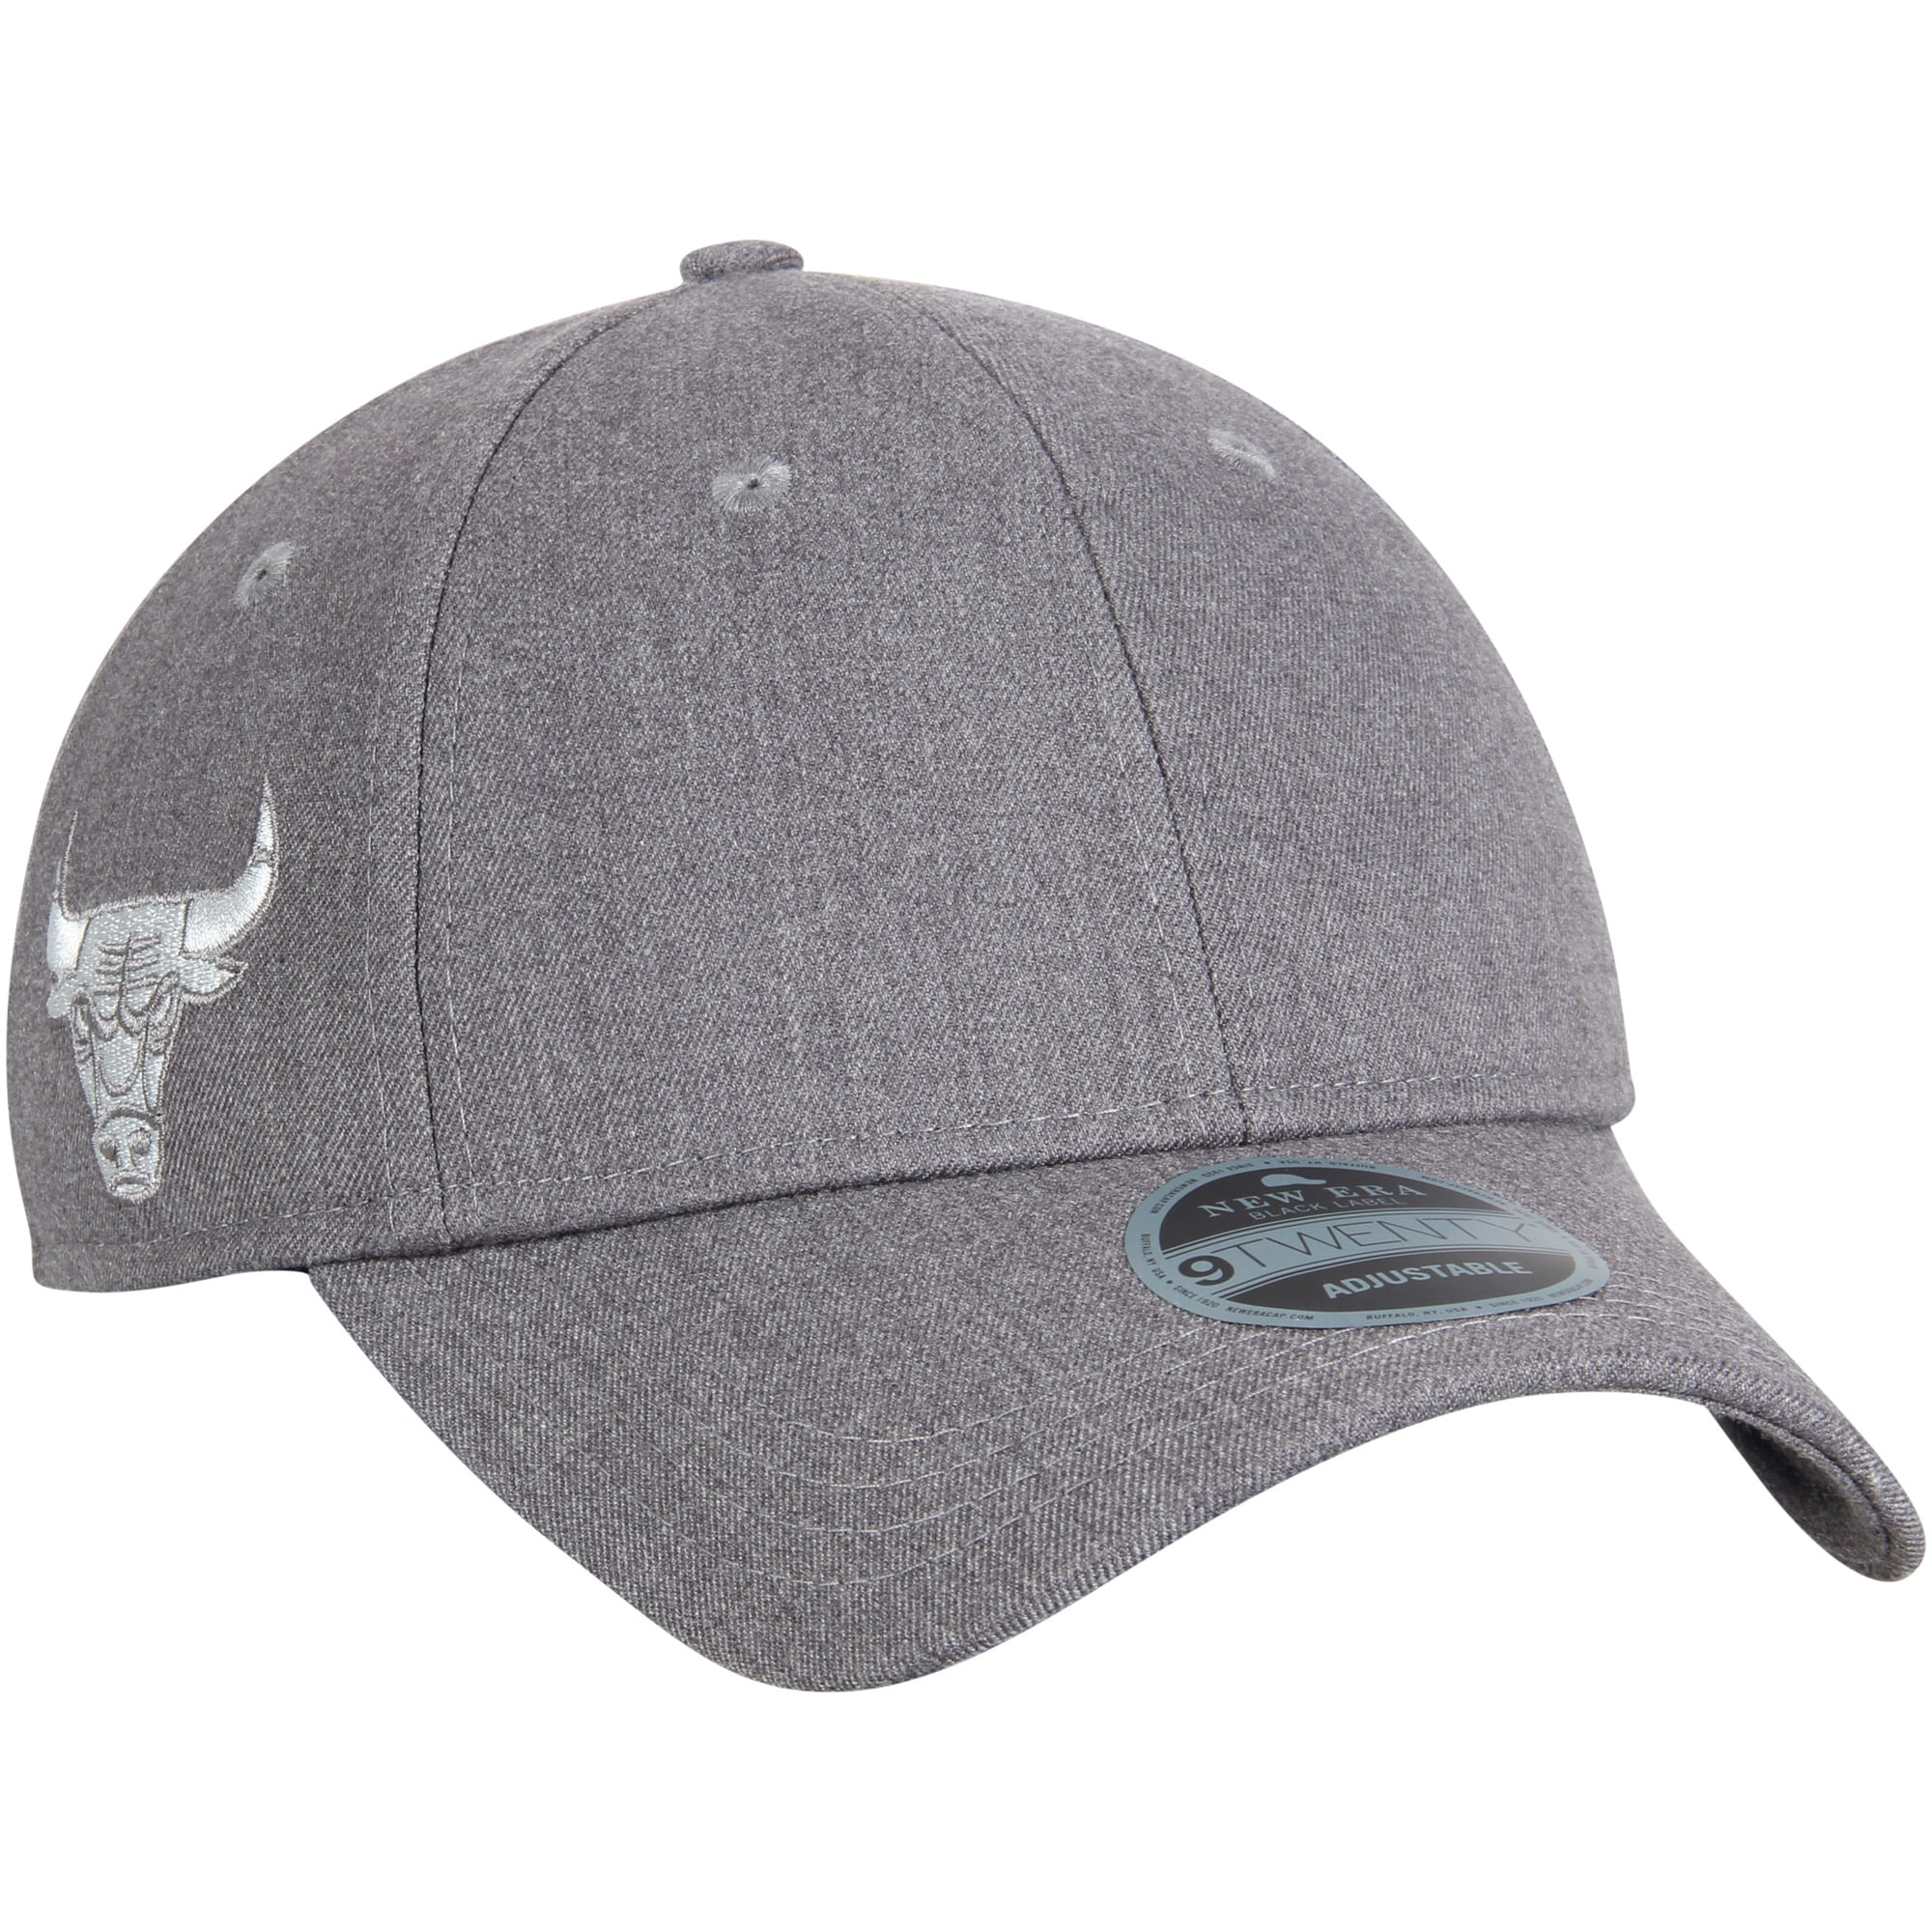 Chicago Bulls New Era Black Label Series Suiting 9TWENTY Adjustable Hat - Gray